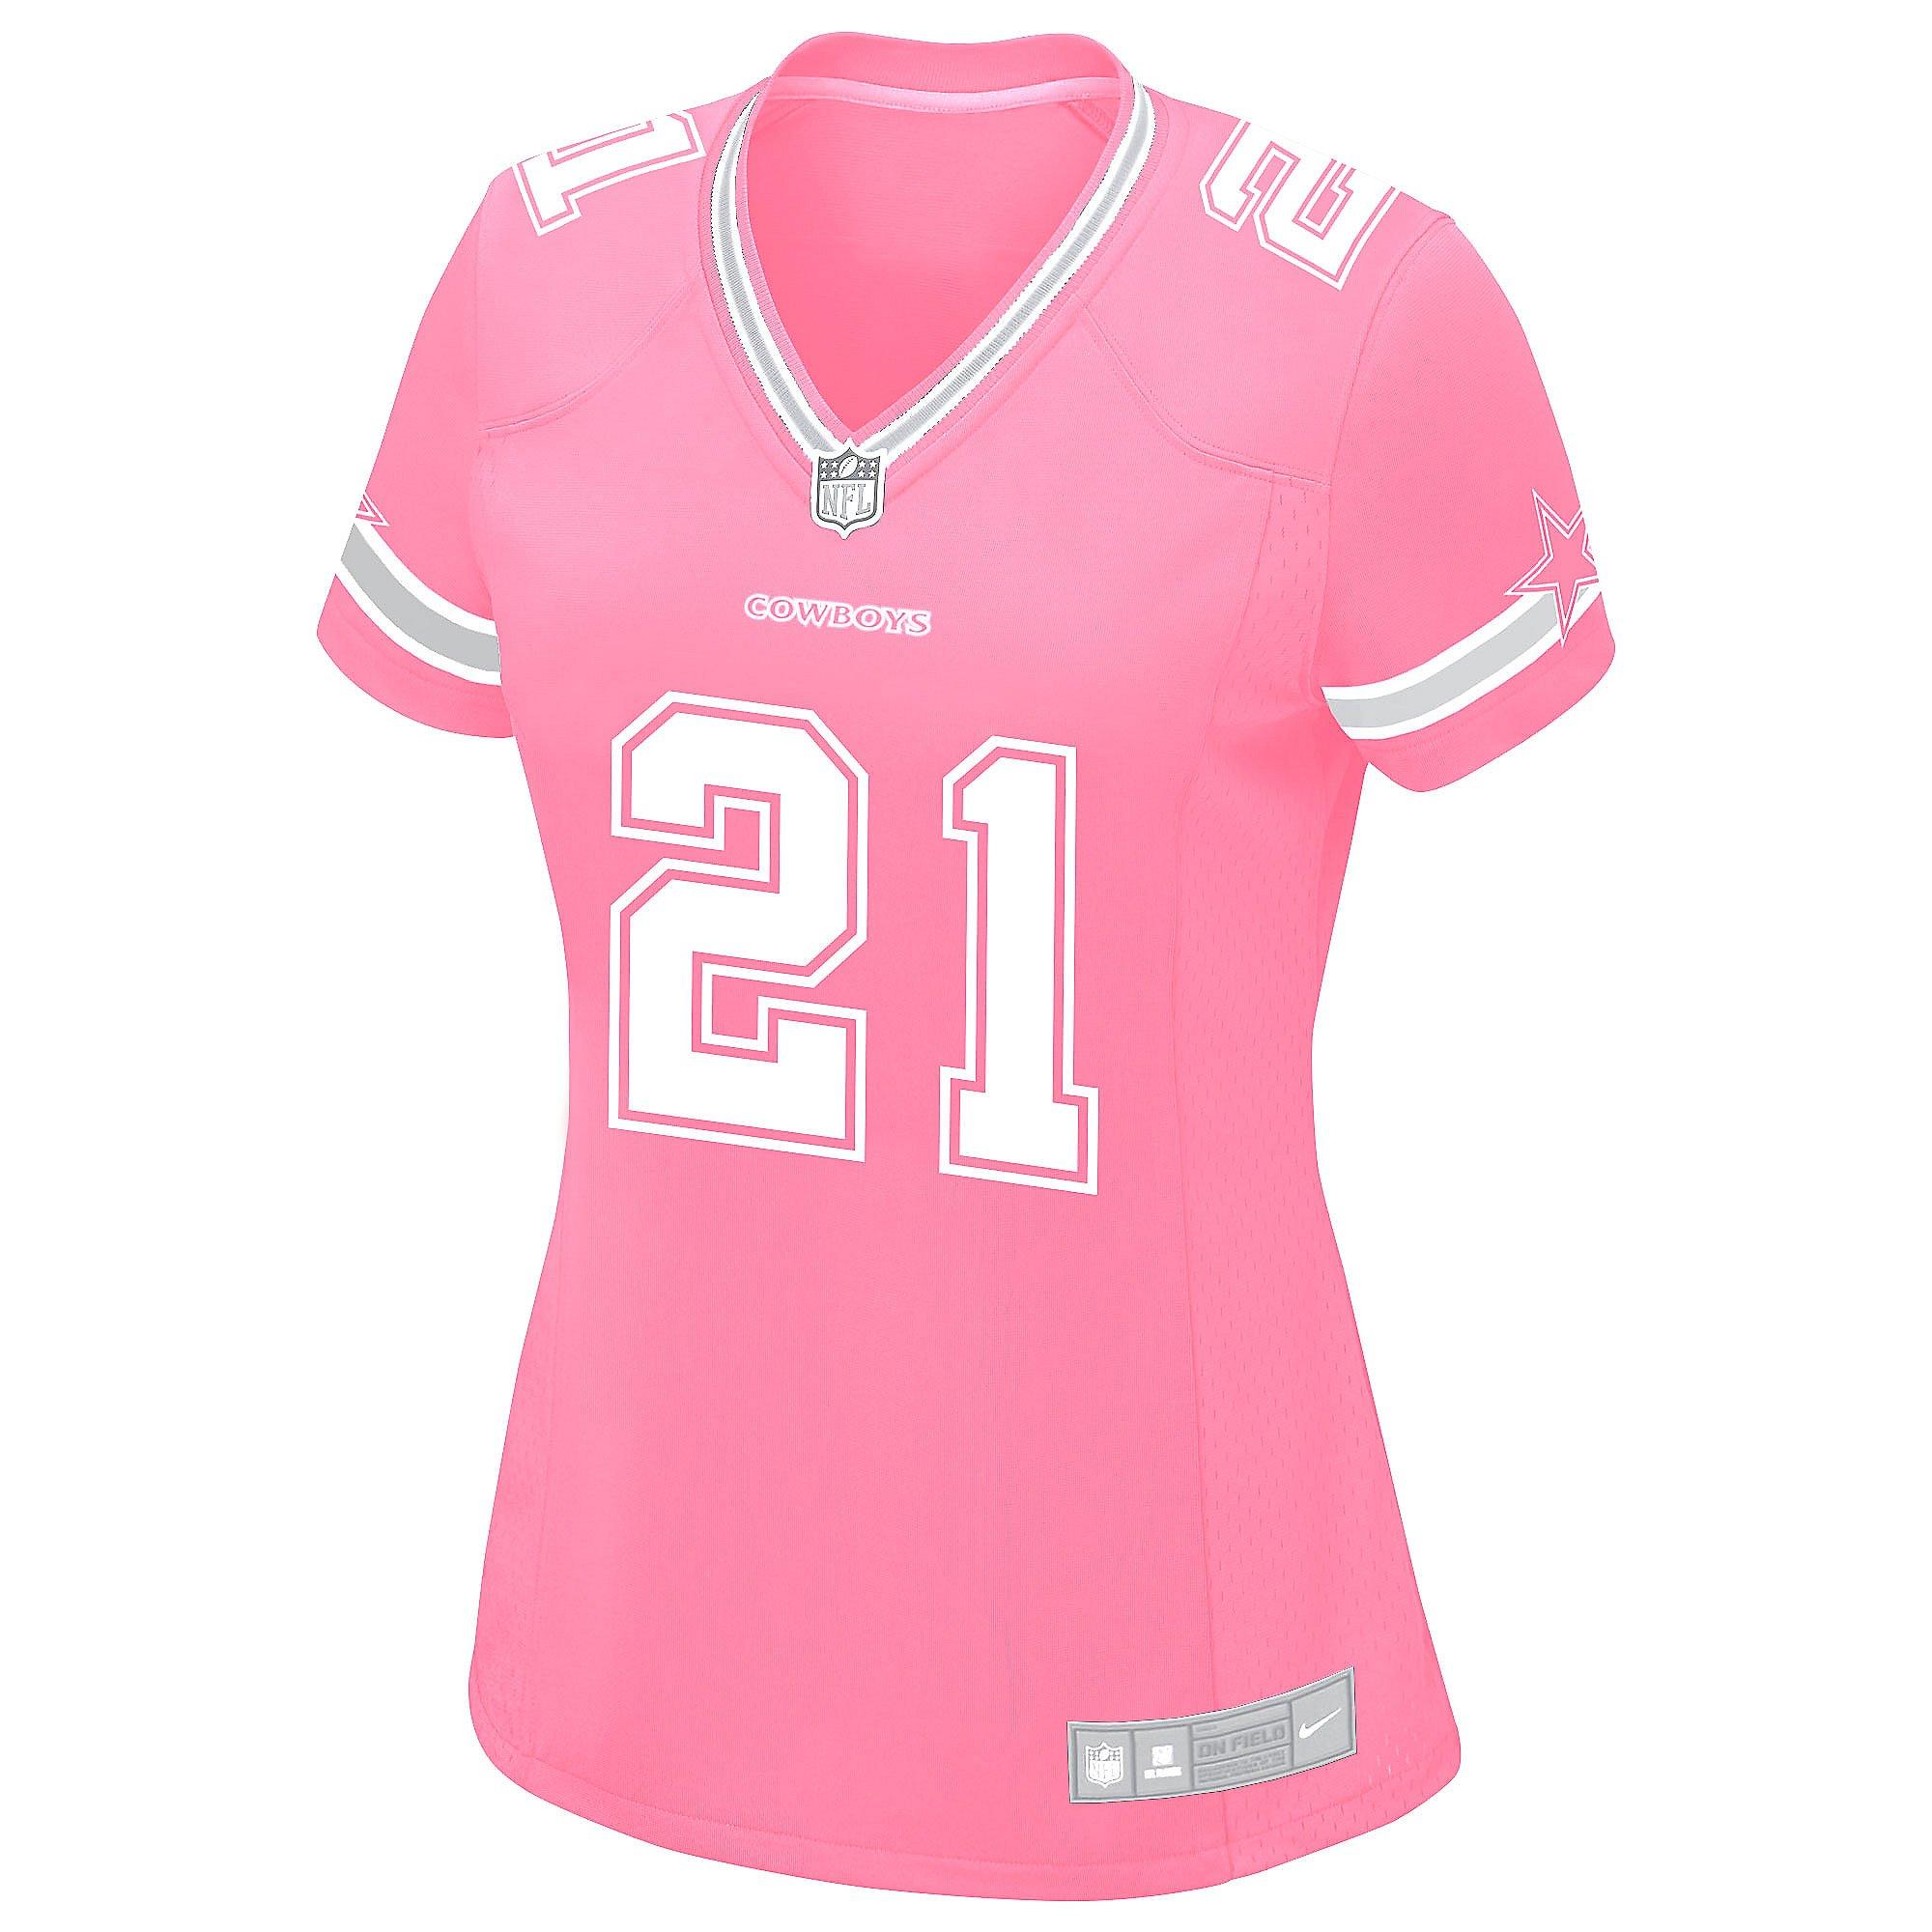 Dallas Cowboys Womens Ezekiel Elliott #21 Pink Jersey | Dallas ...